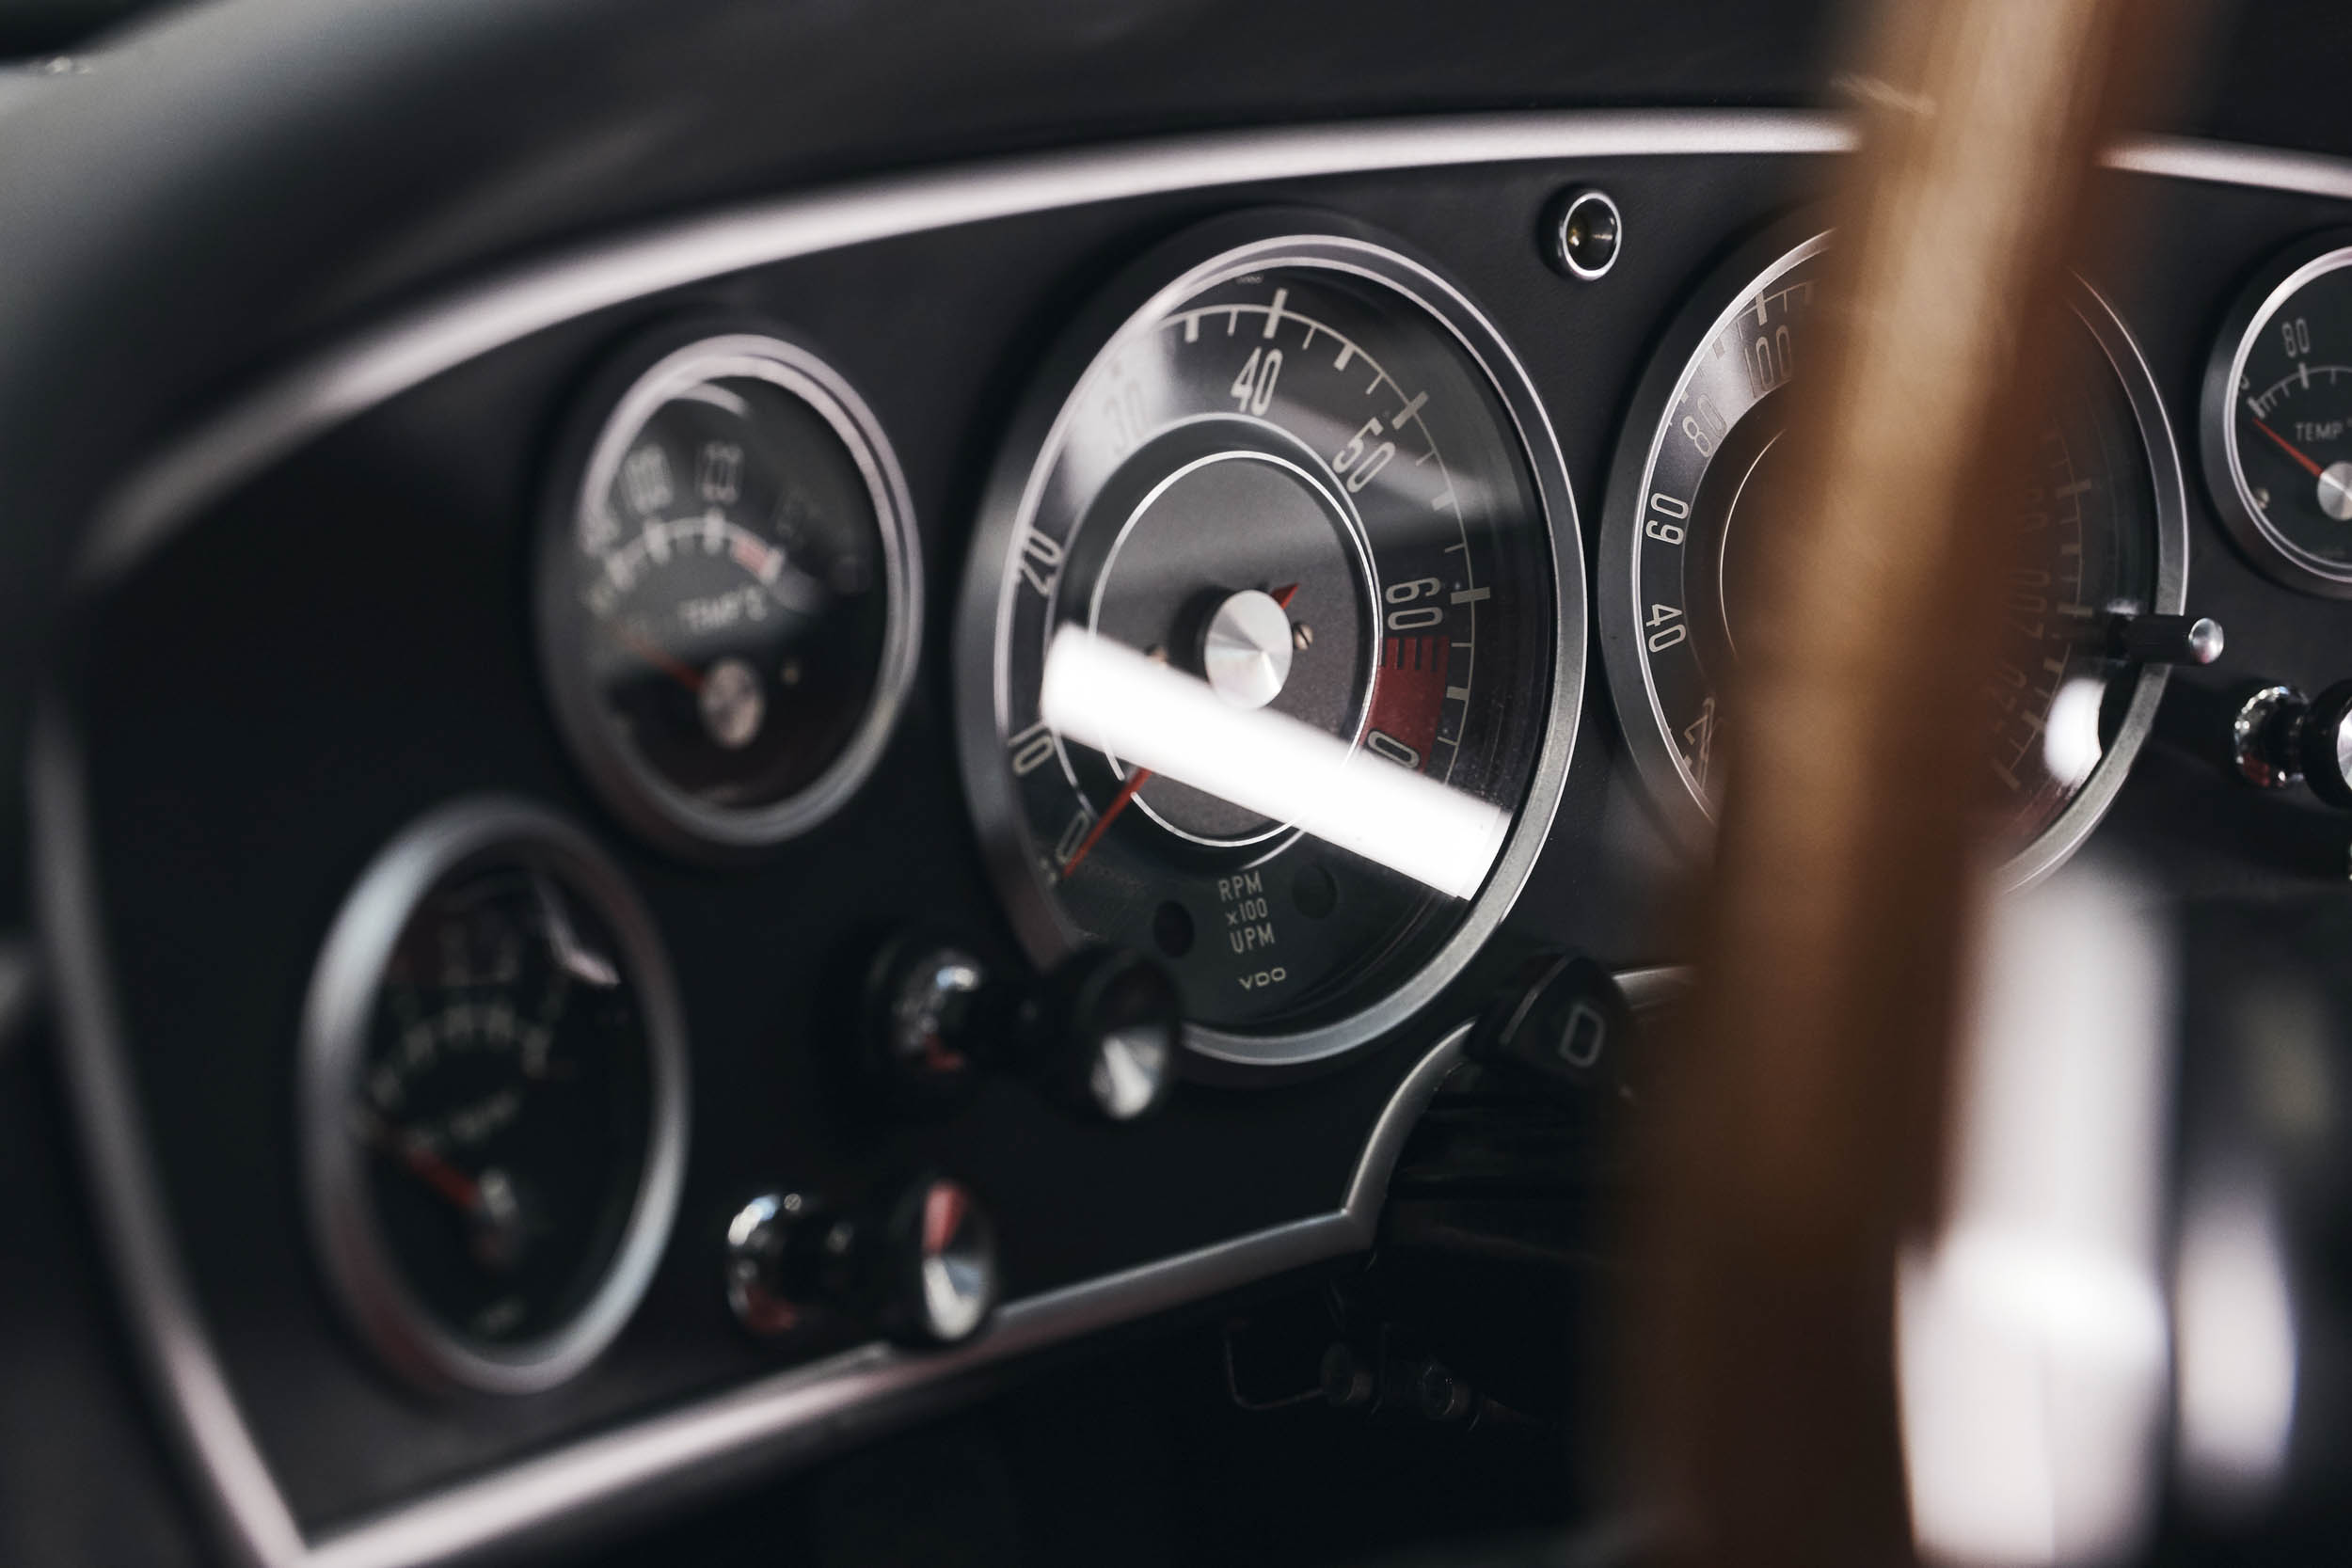 BMW 1600 GT convertible dash